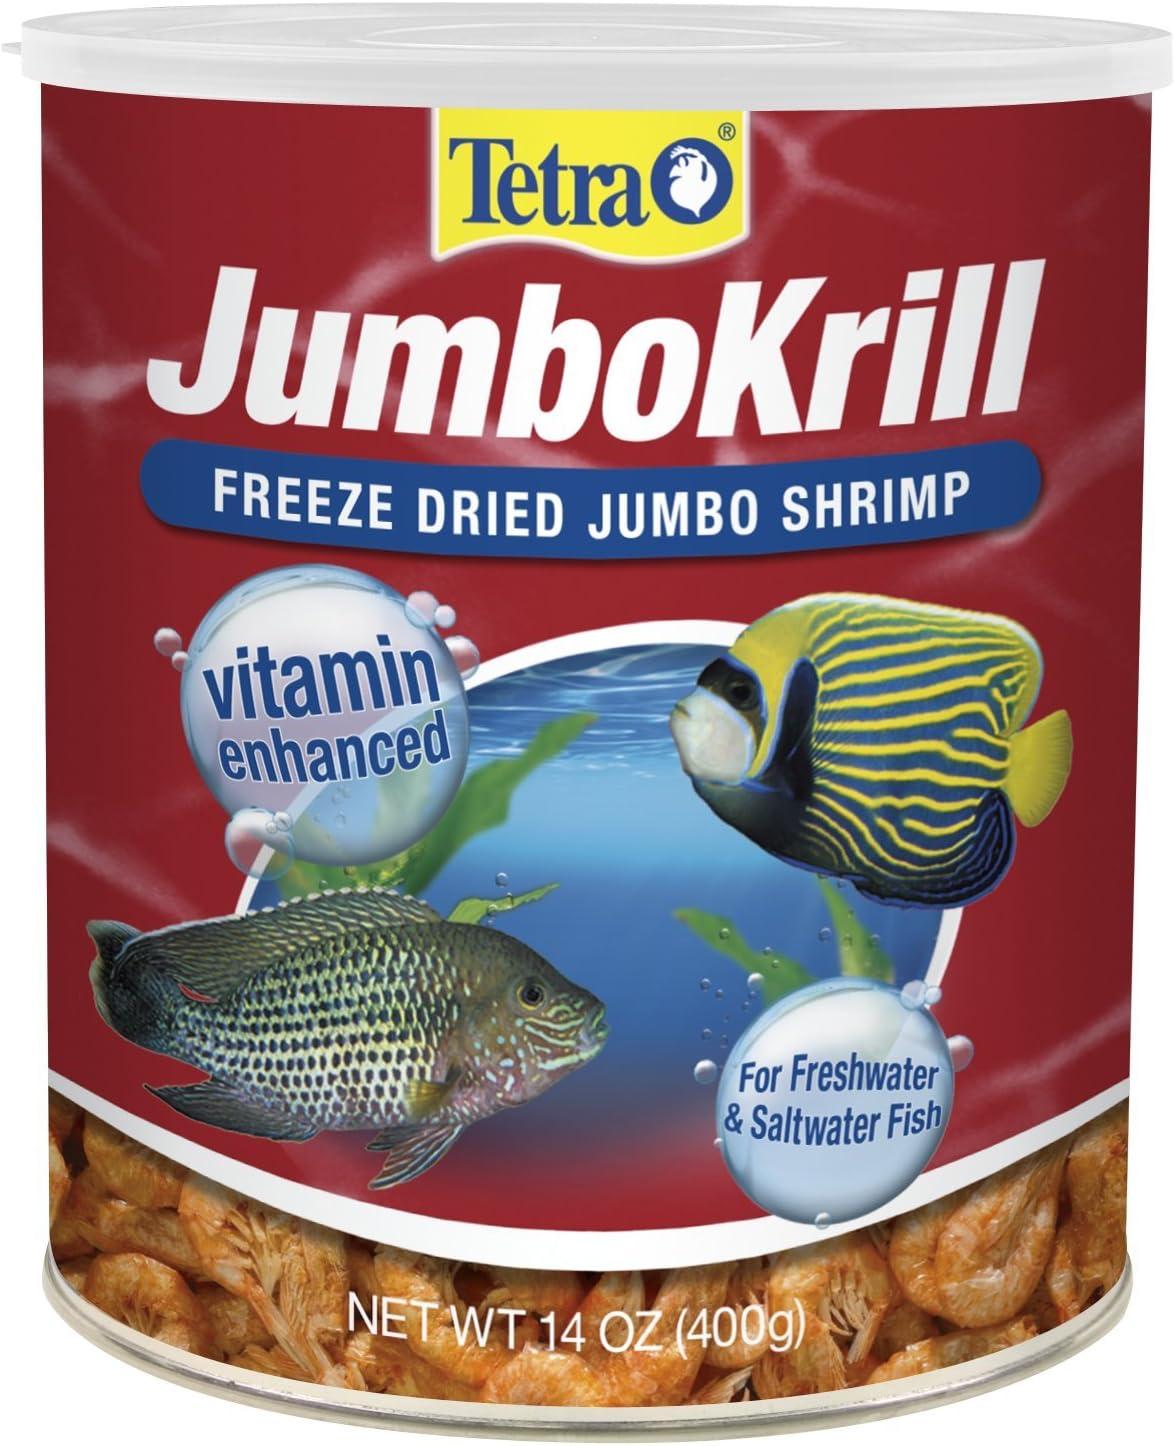 Tetra 16200 84 oz Jumbo Krill Aquatic Supplement, One Size